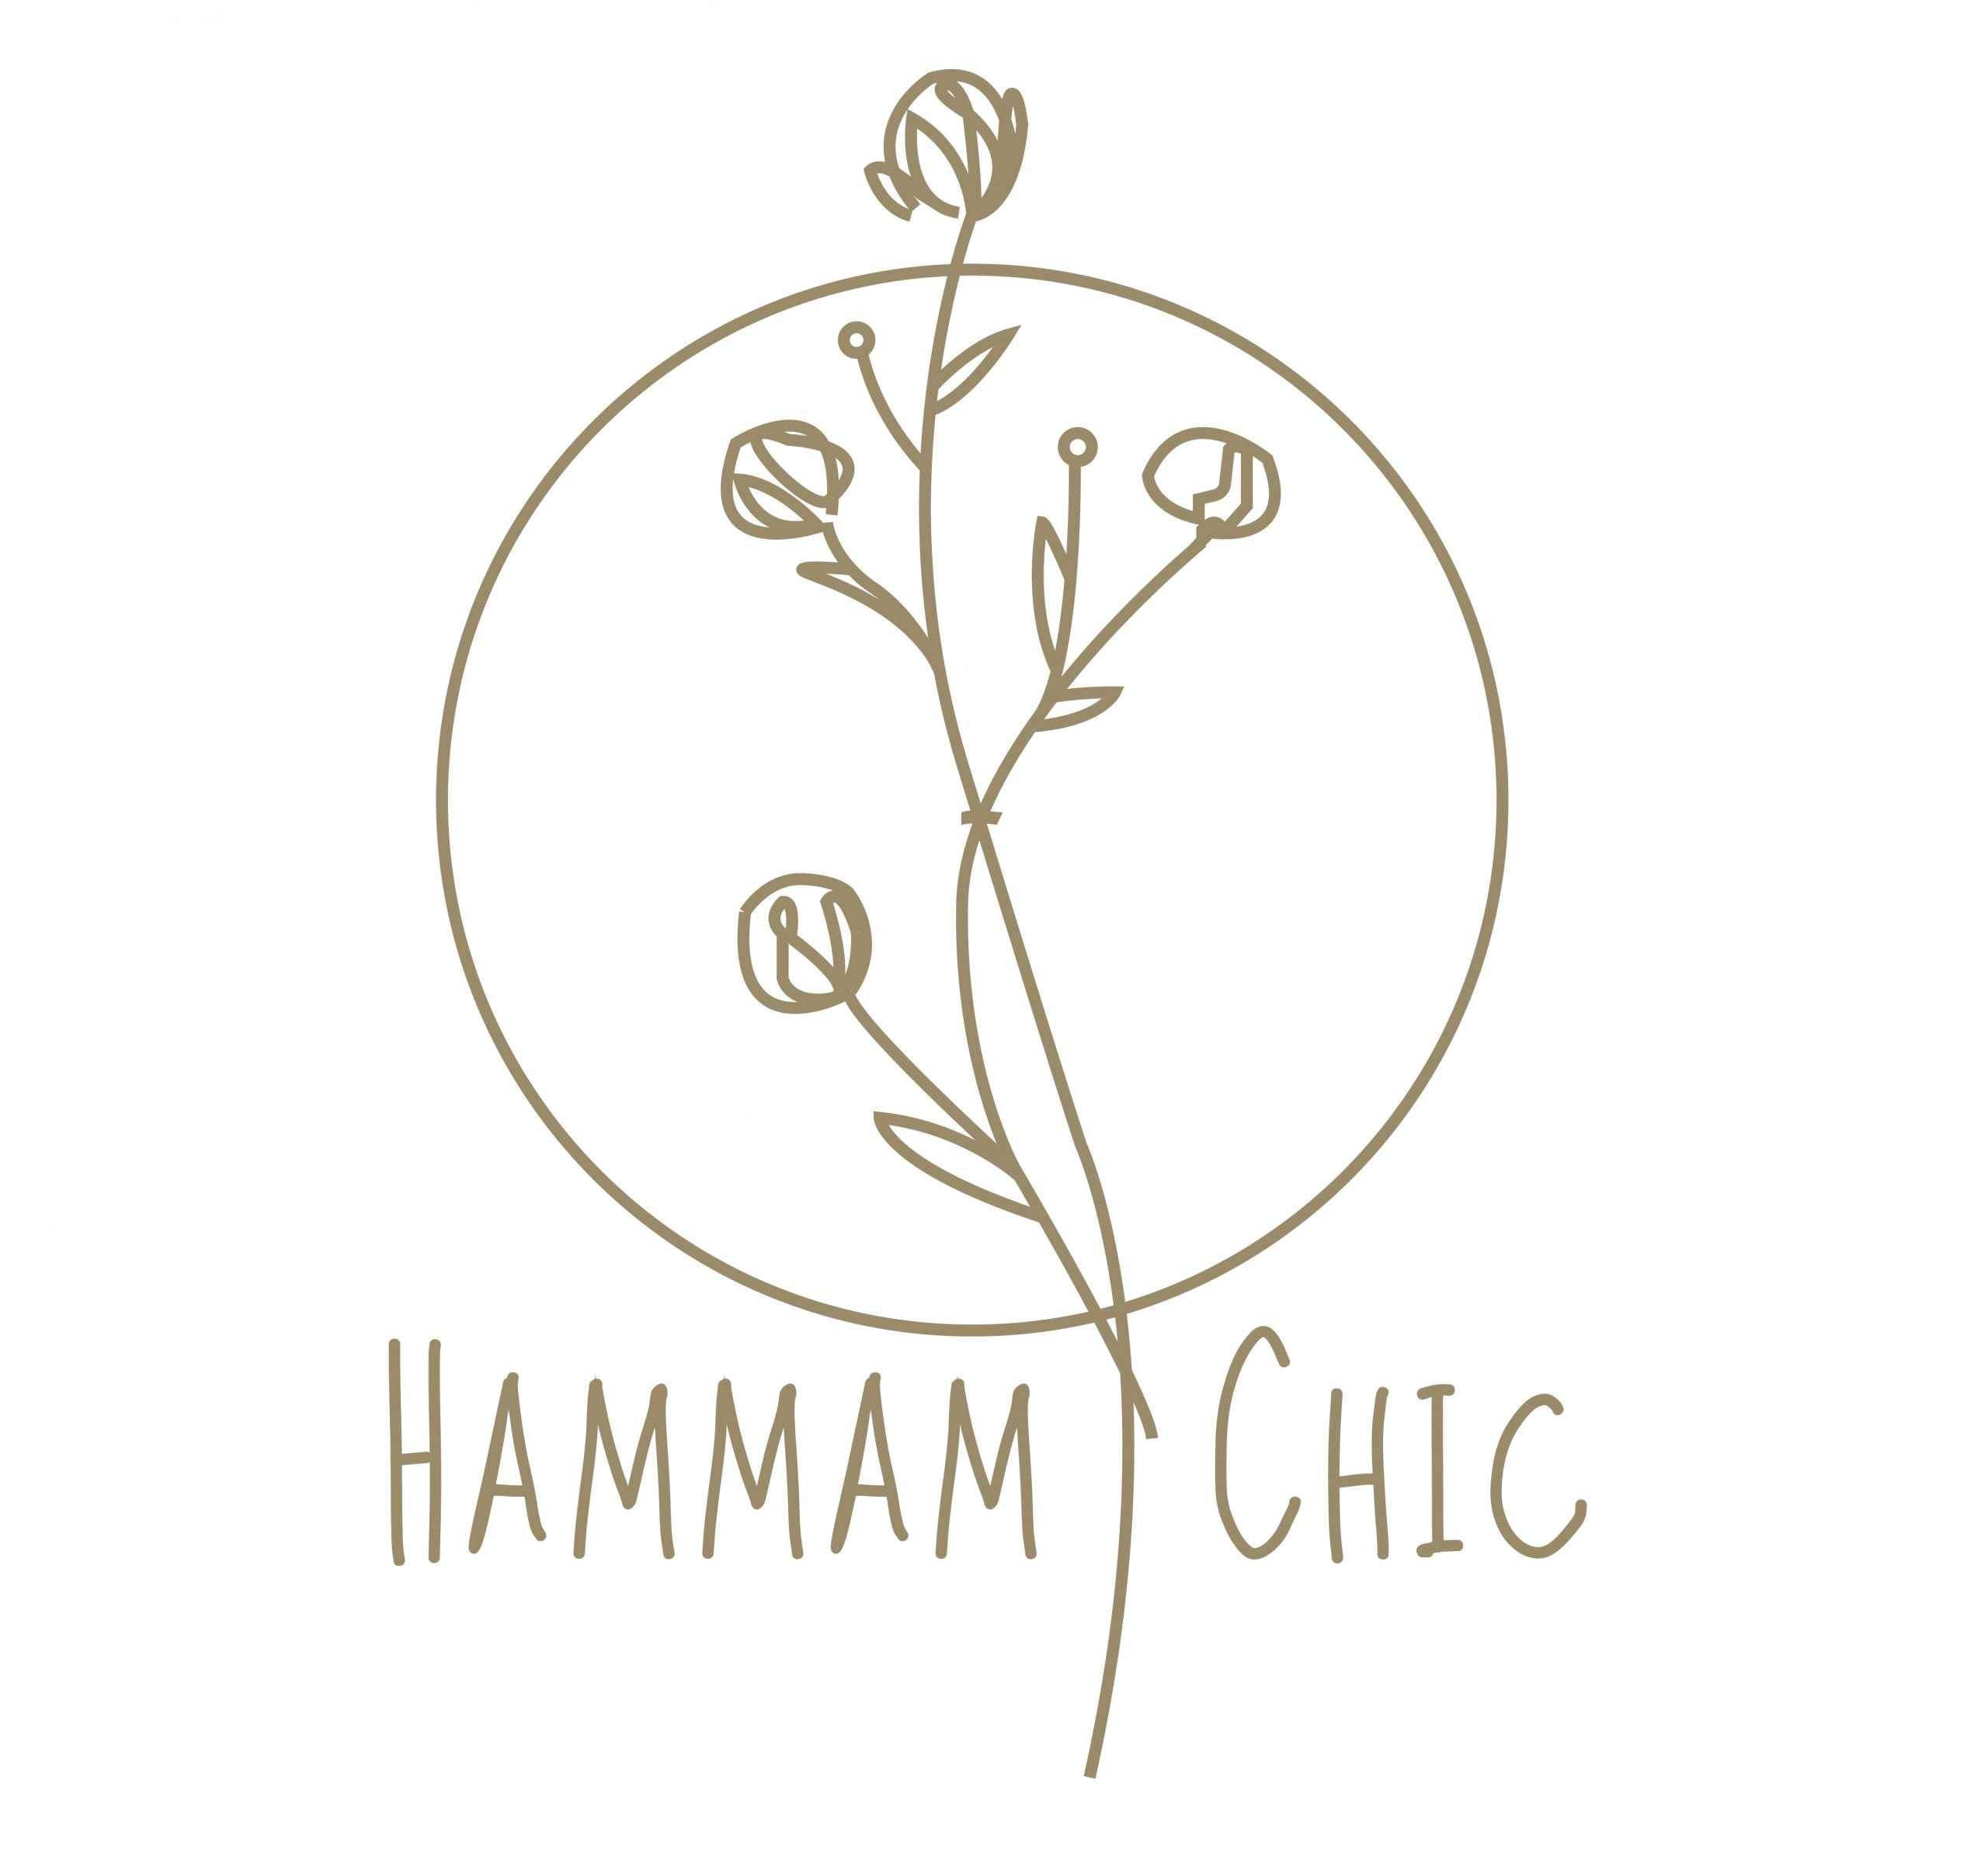 hammamchic.com